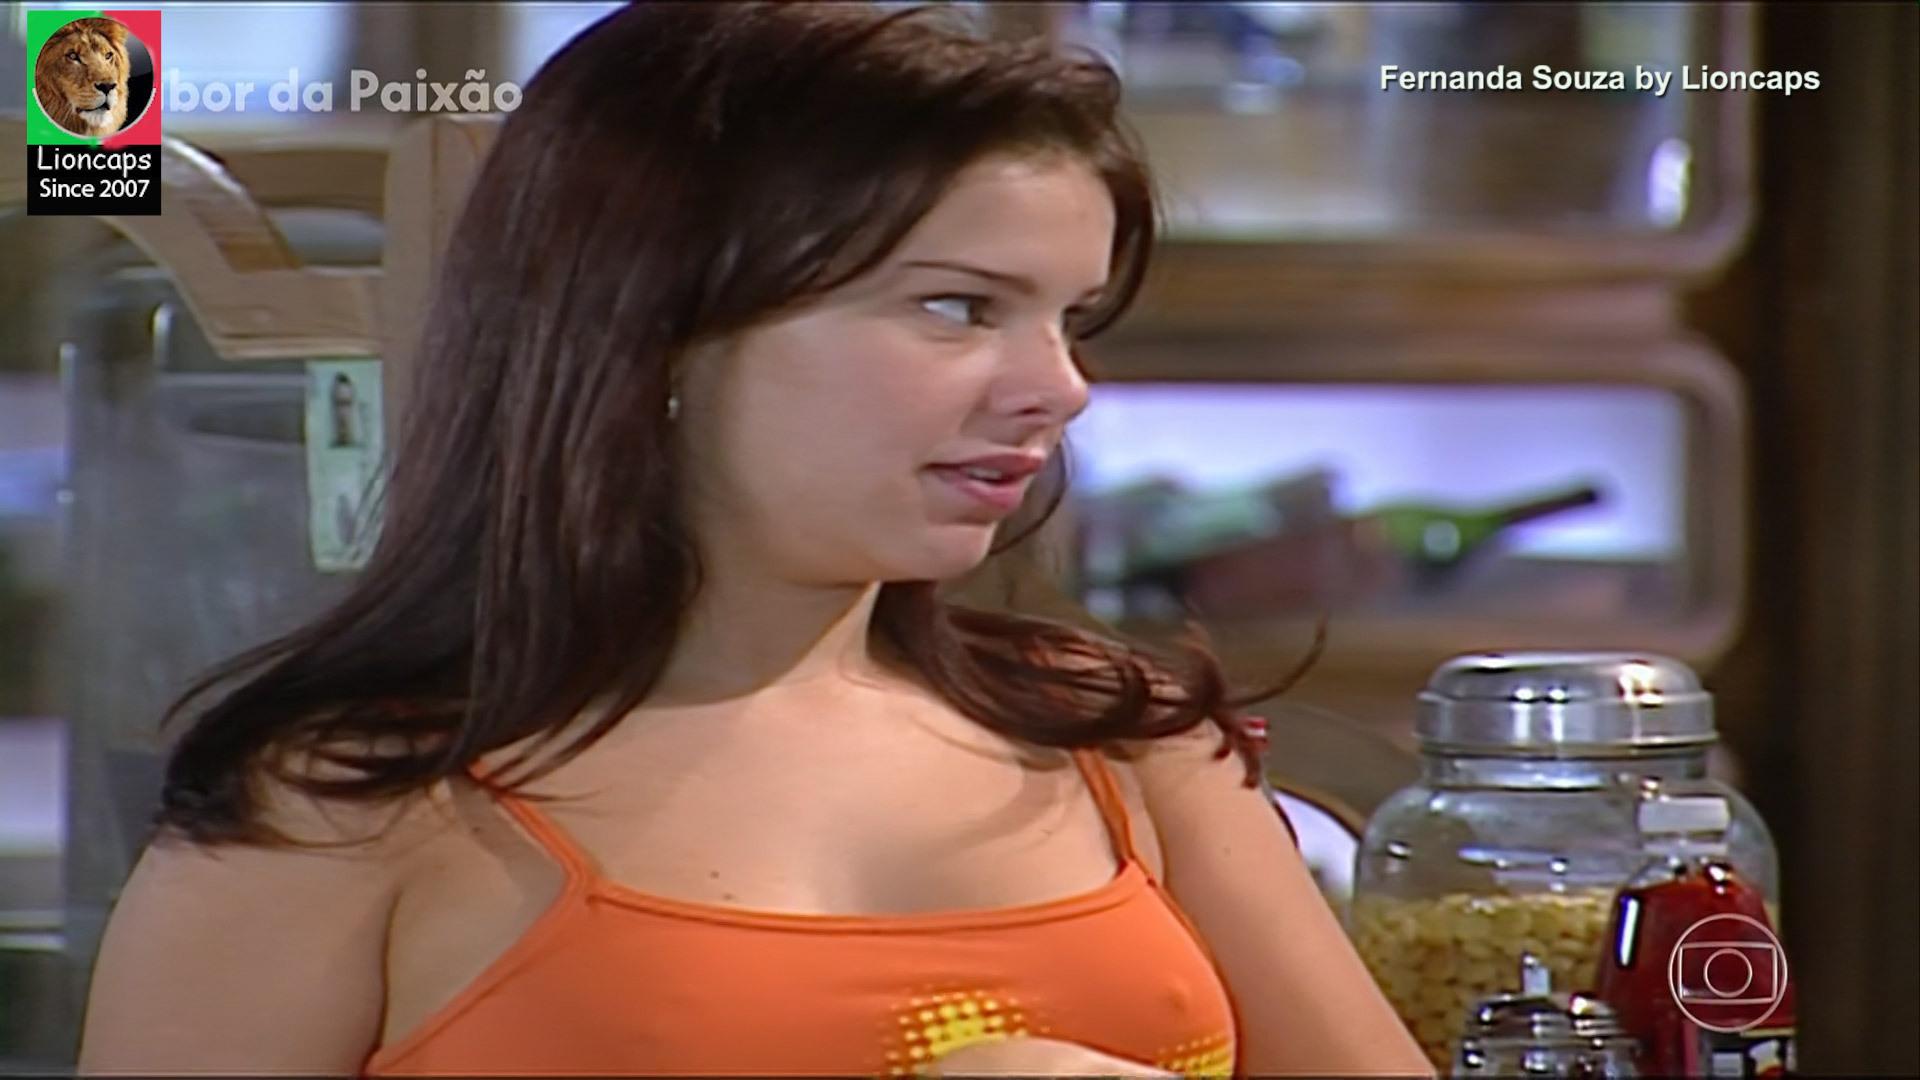 fernanda_souza_varios_lioncaps_29_08_2021 (16).jpg